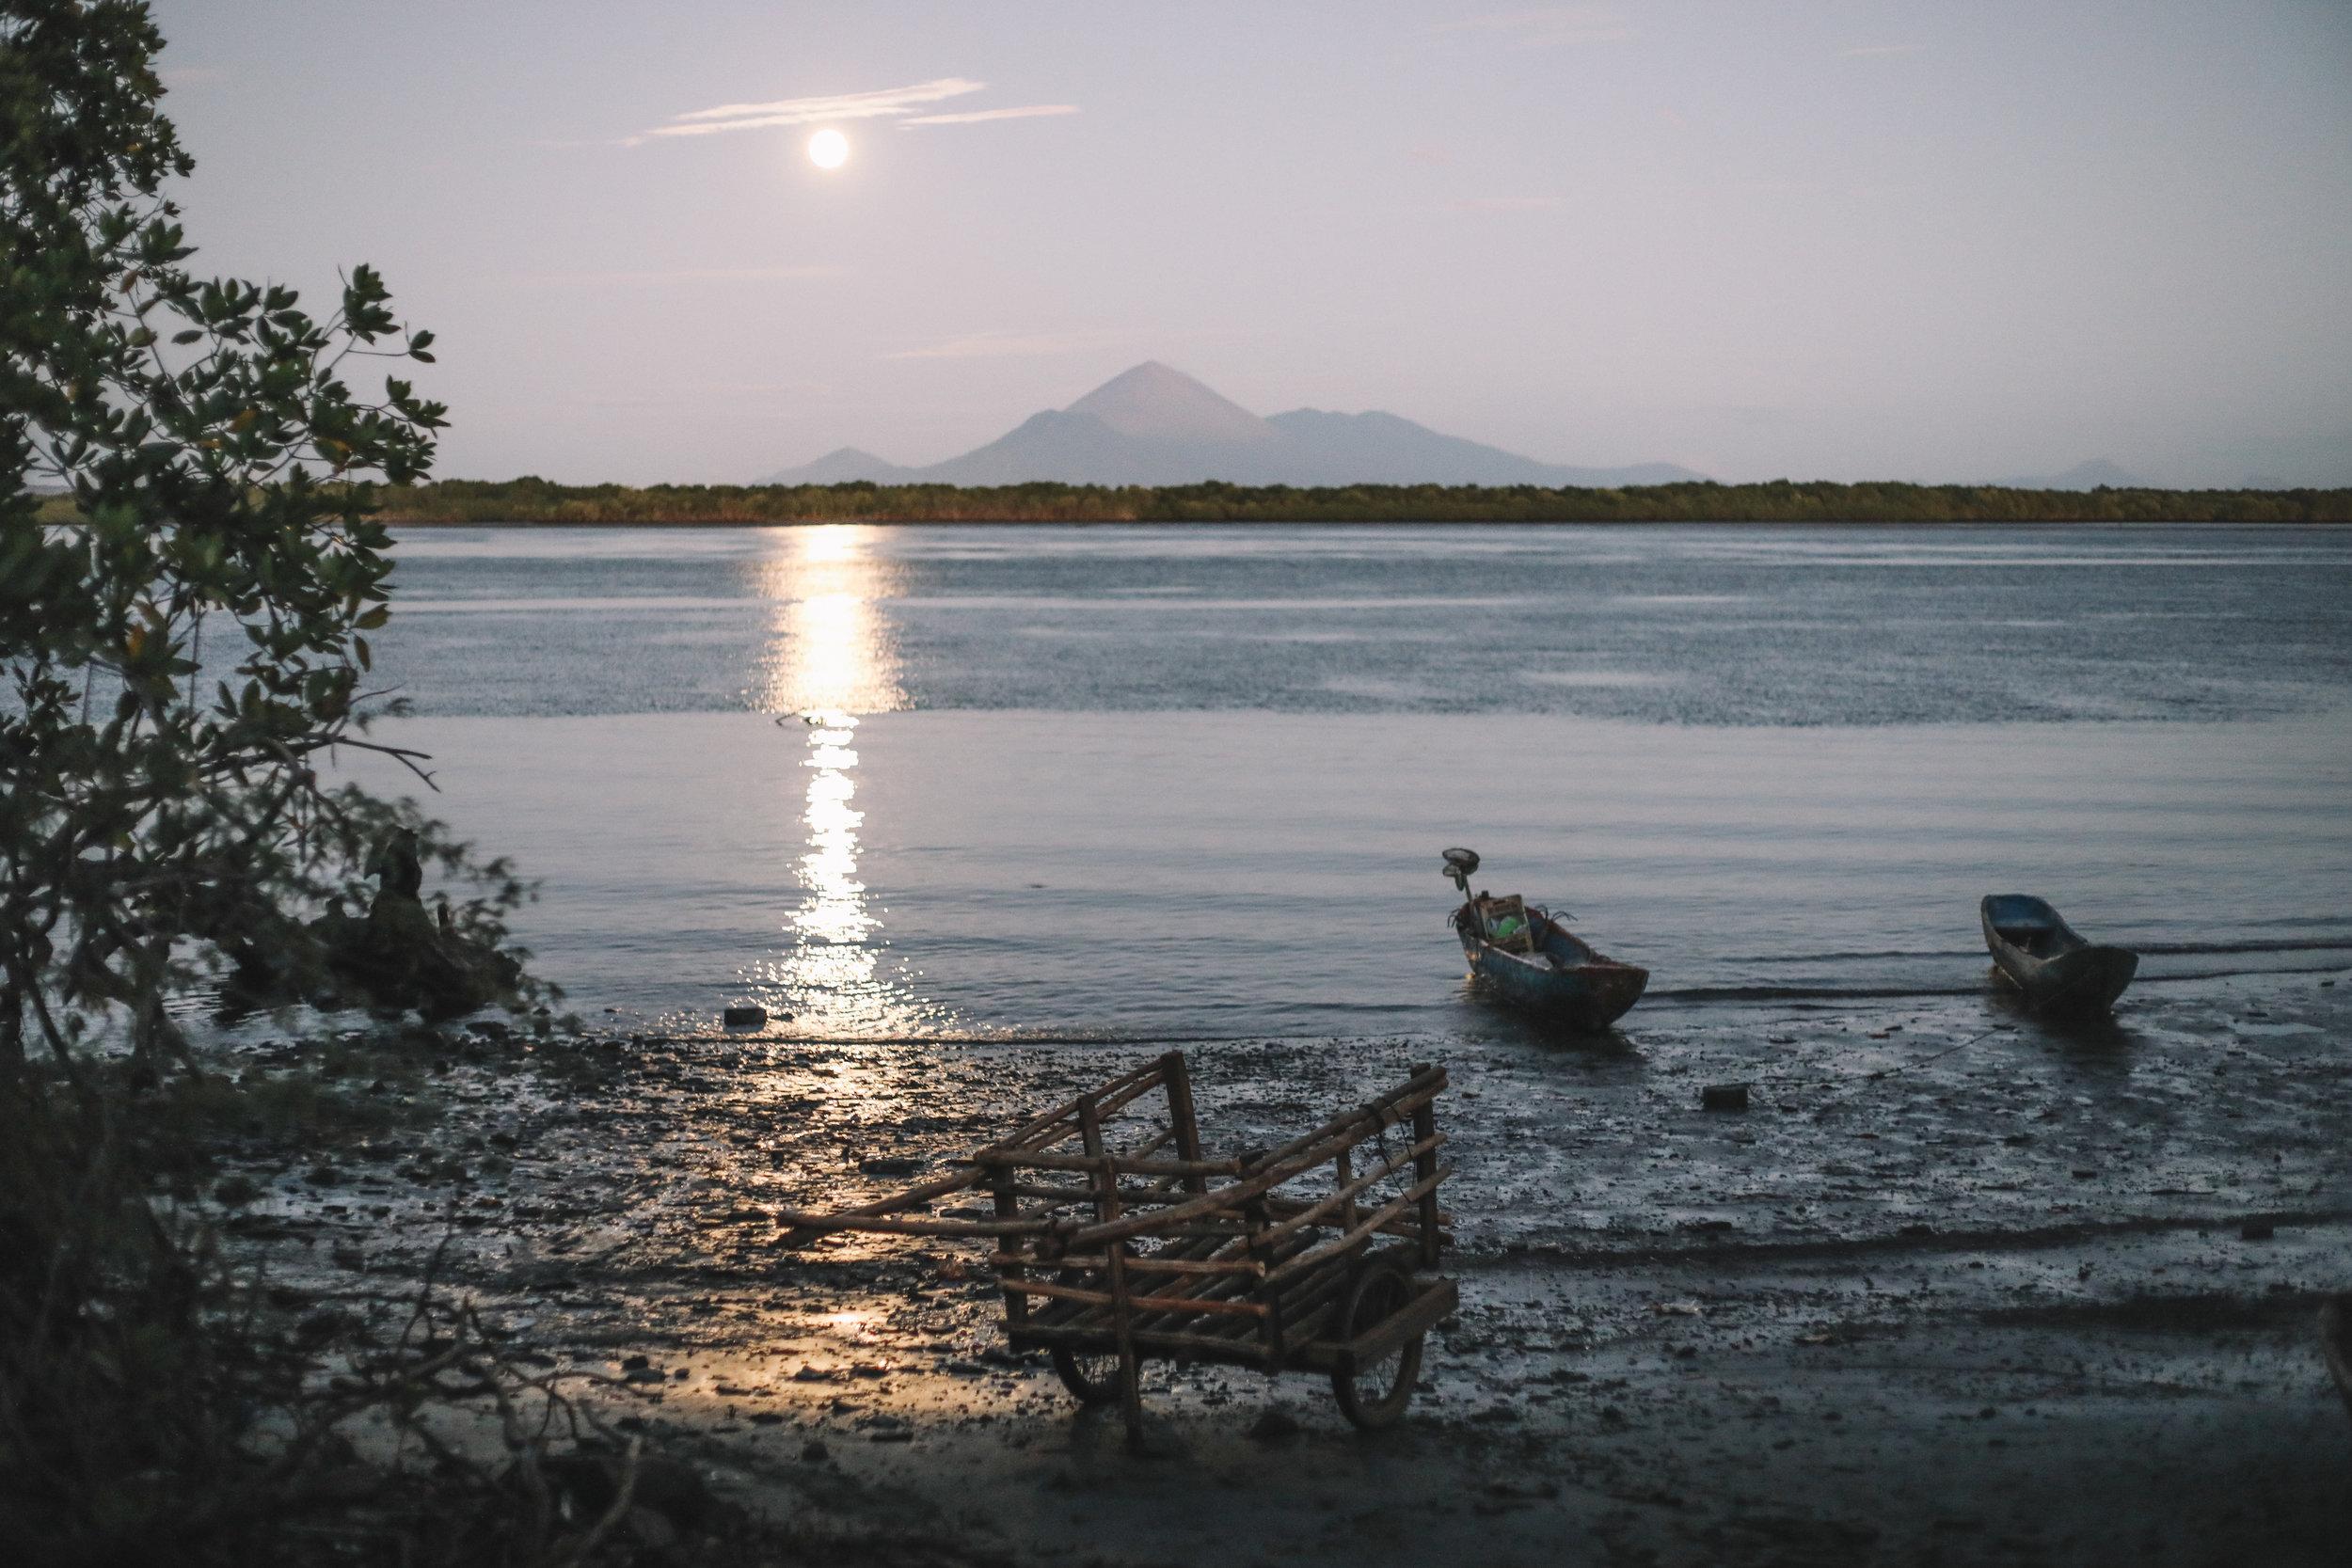 Moonrise over Puesta del Sol.